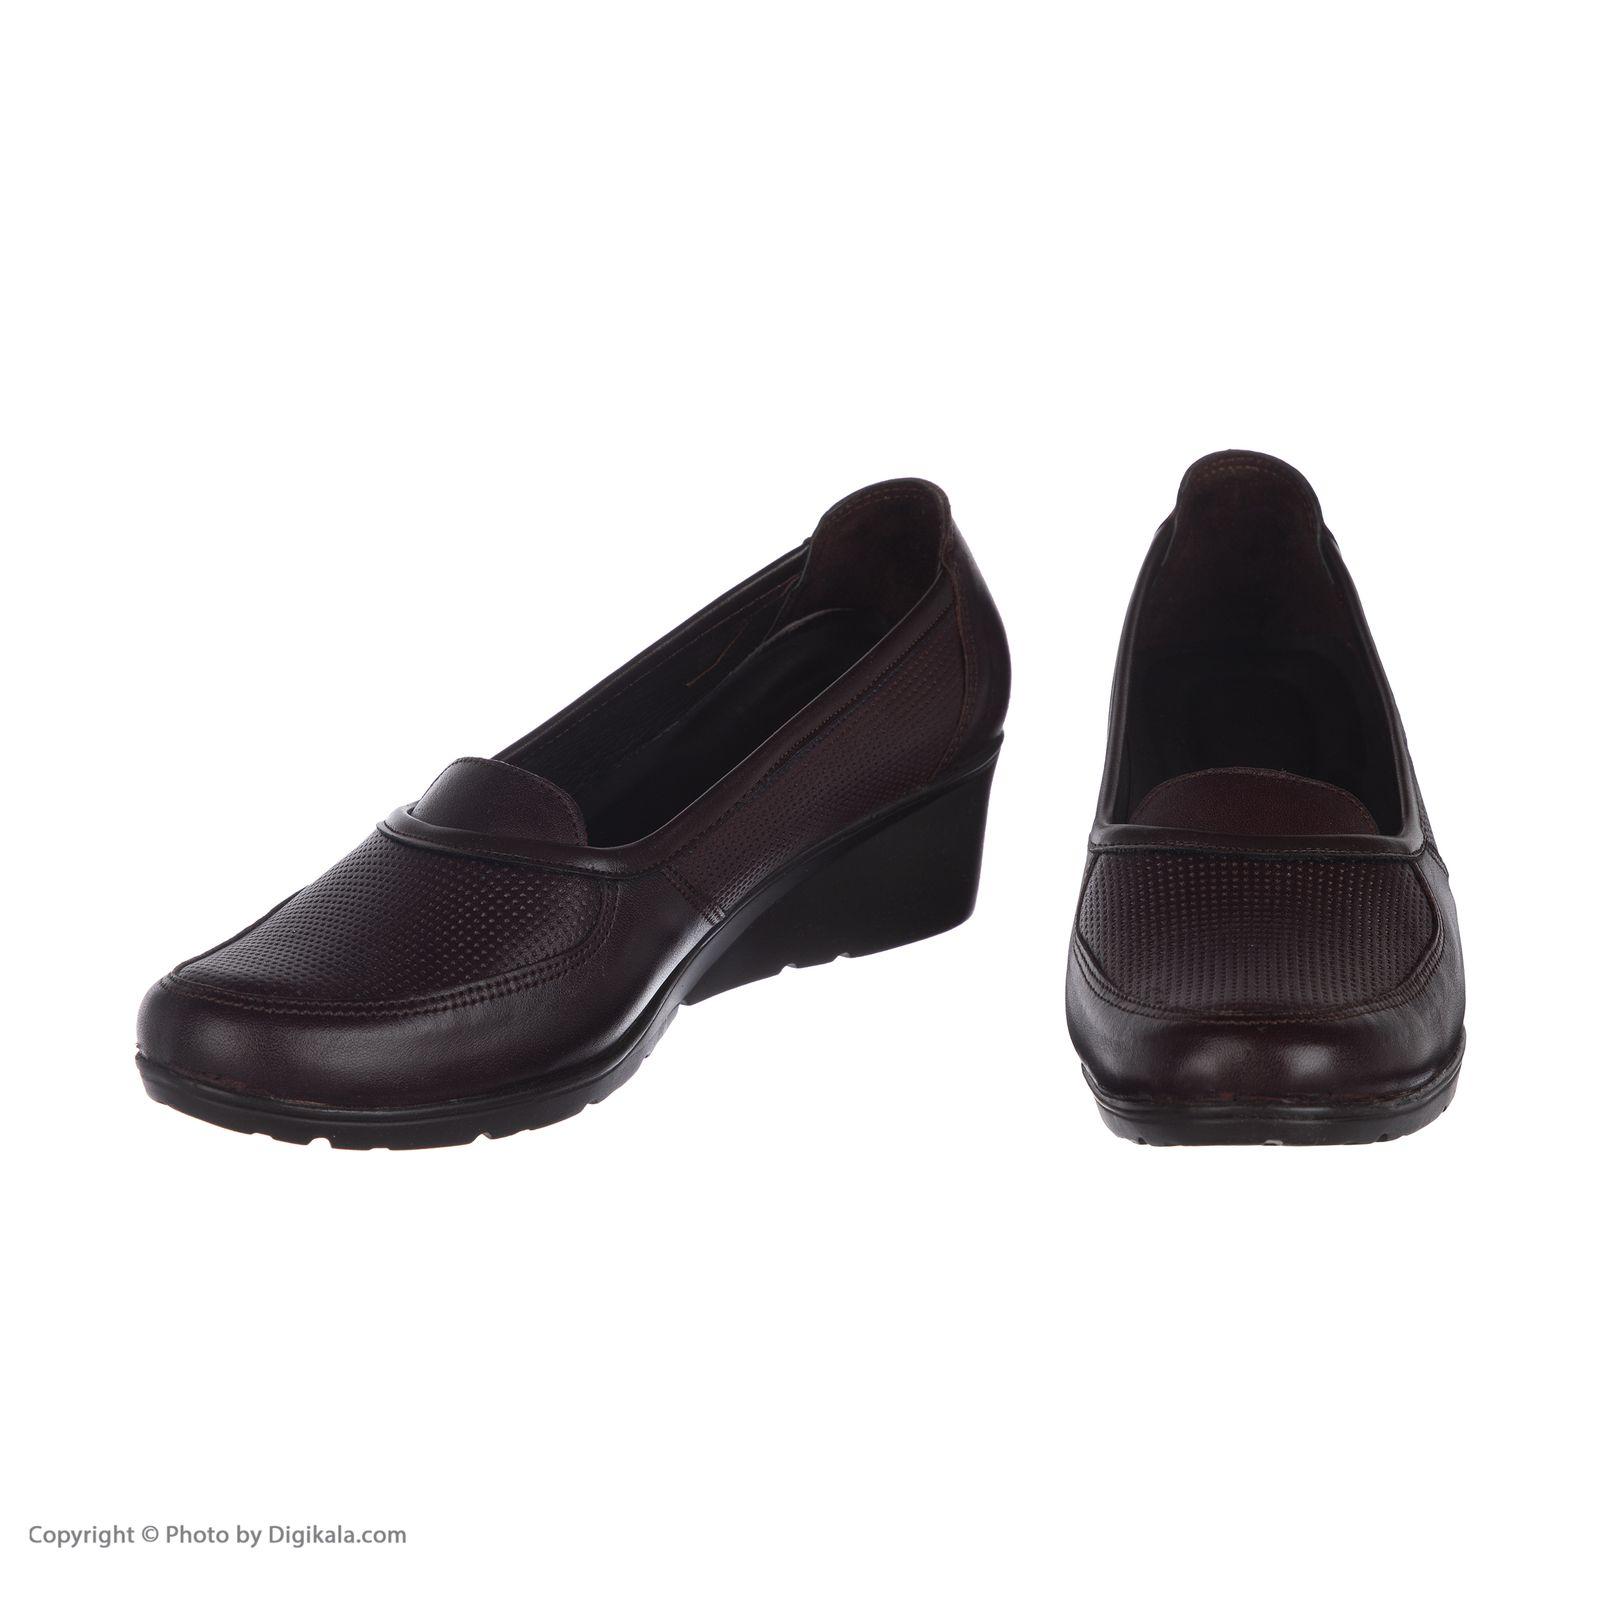 کفش روزمره زنانه دانادل مدل 6602A500104 -  - 4